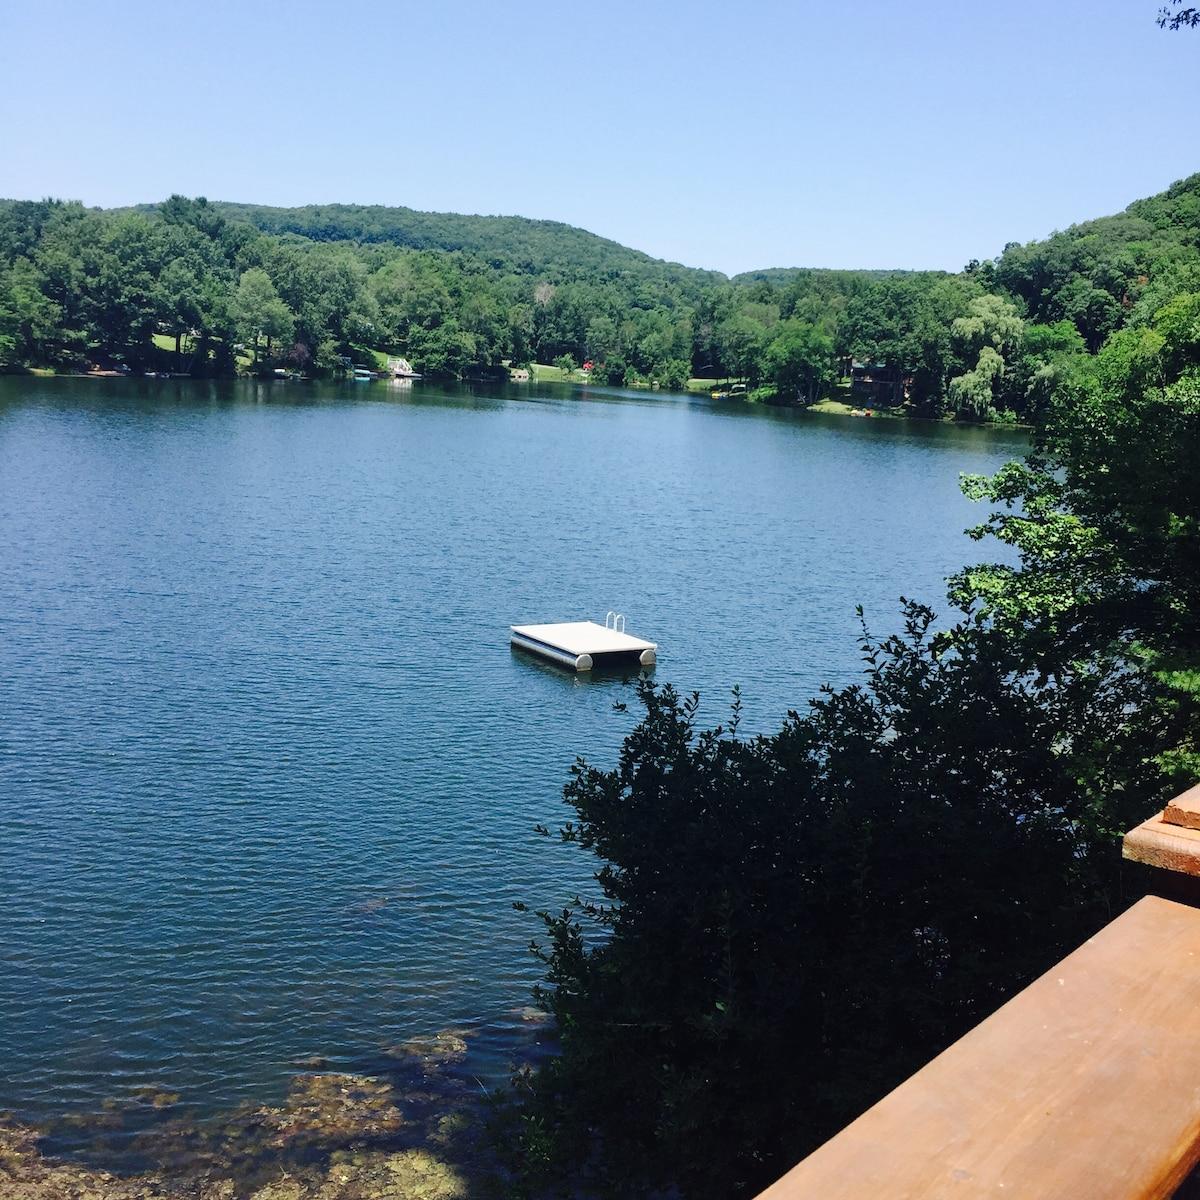 Lake House in the Berkshires in NY